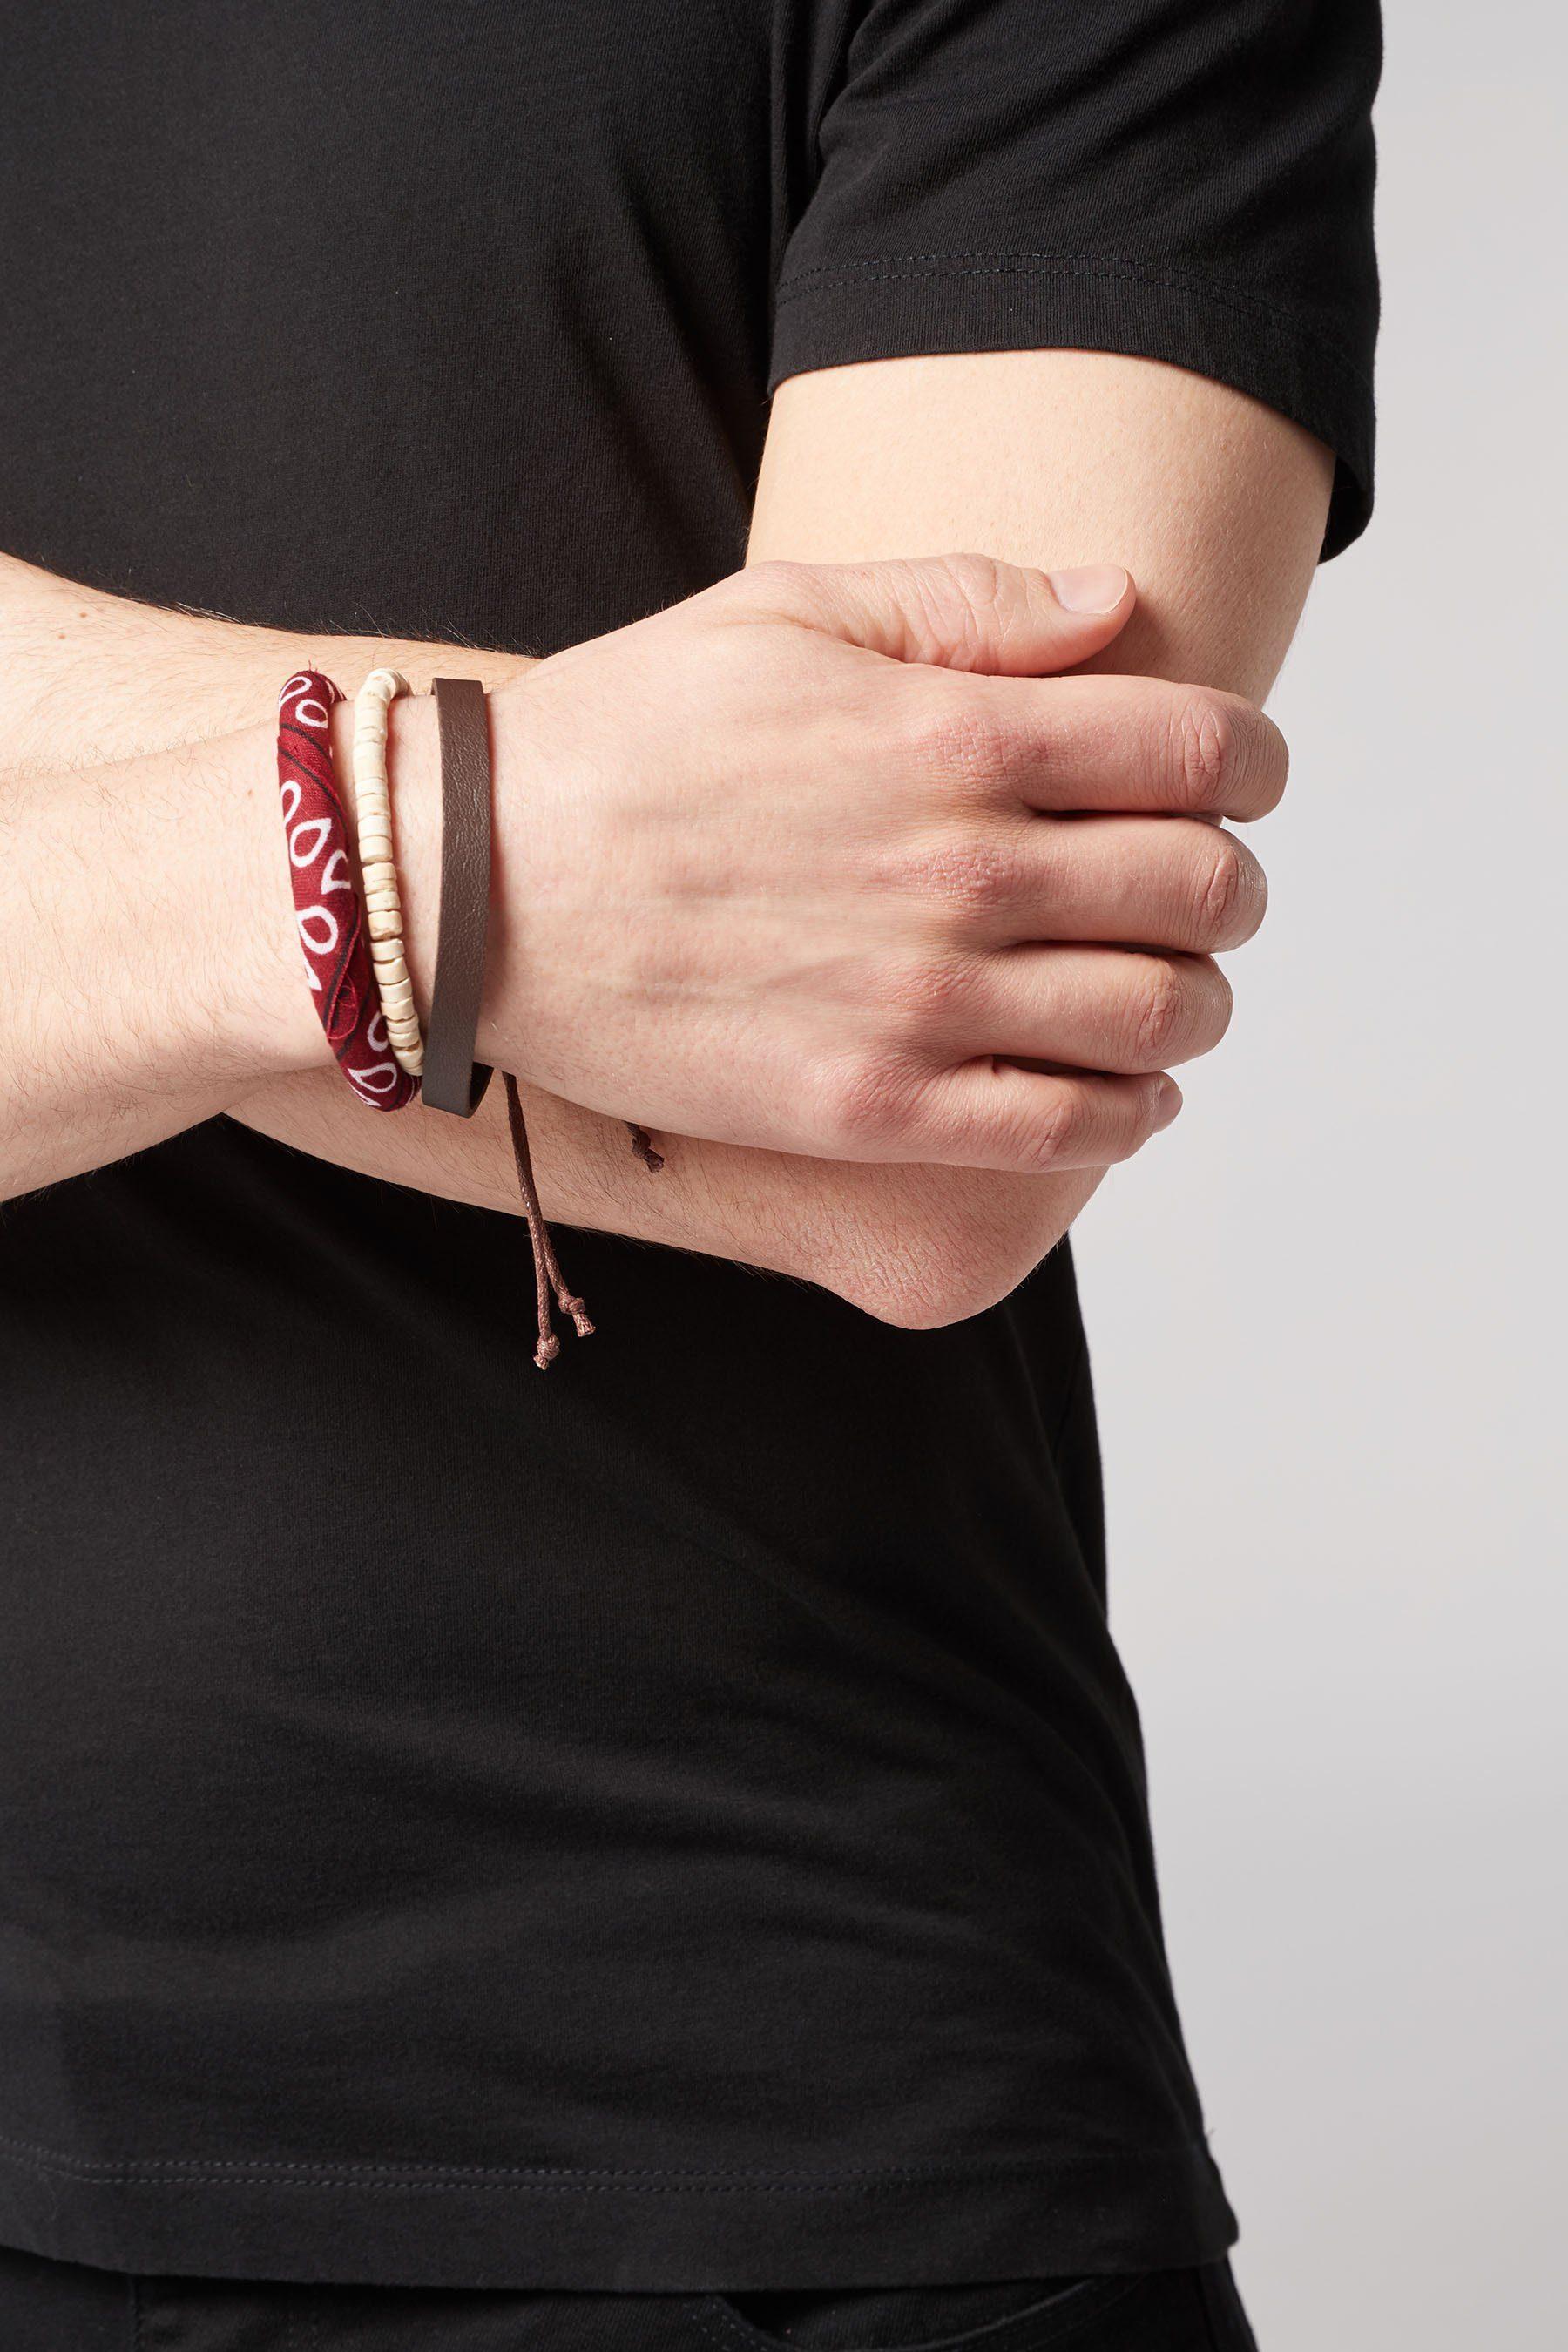 Next Bandana-Armbänder, 3er-Pack